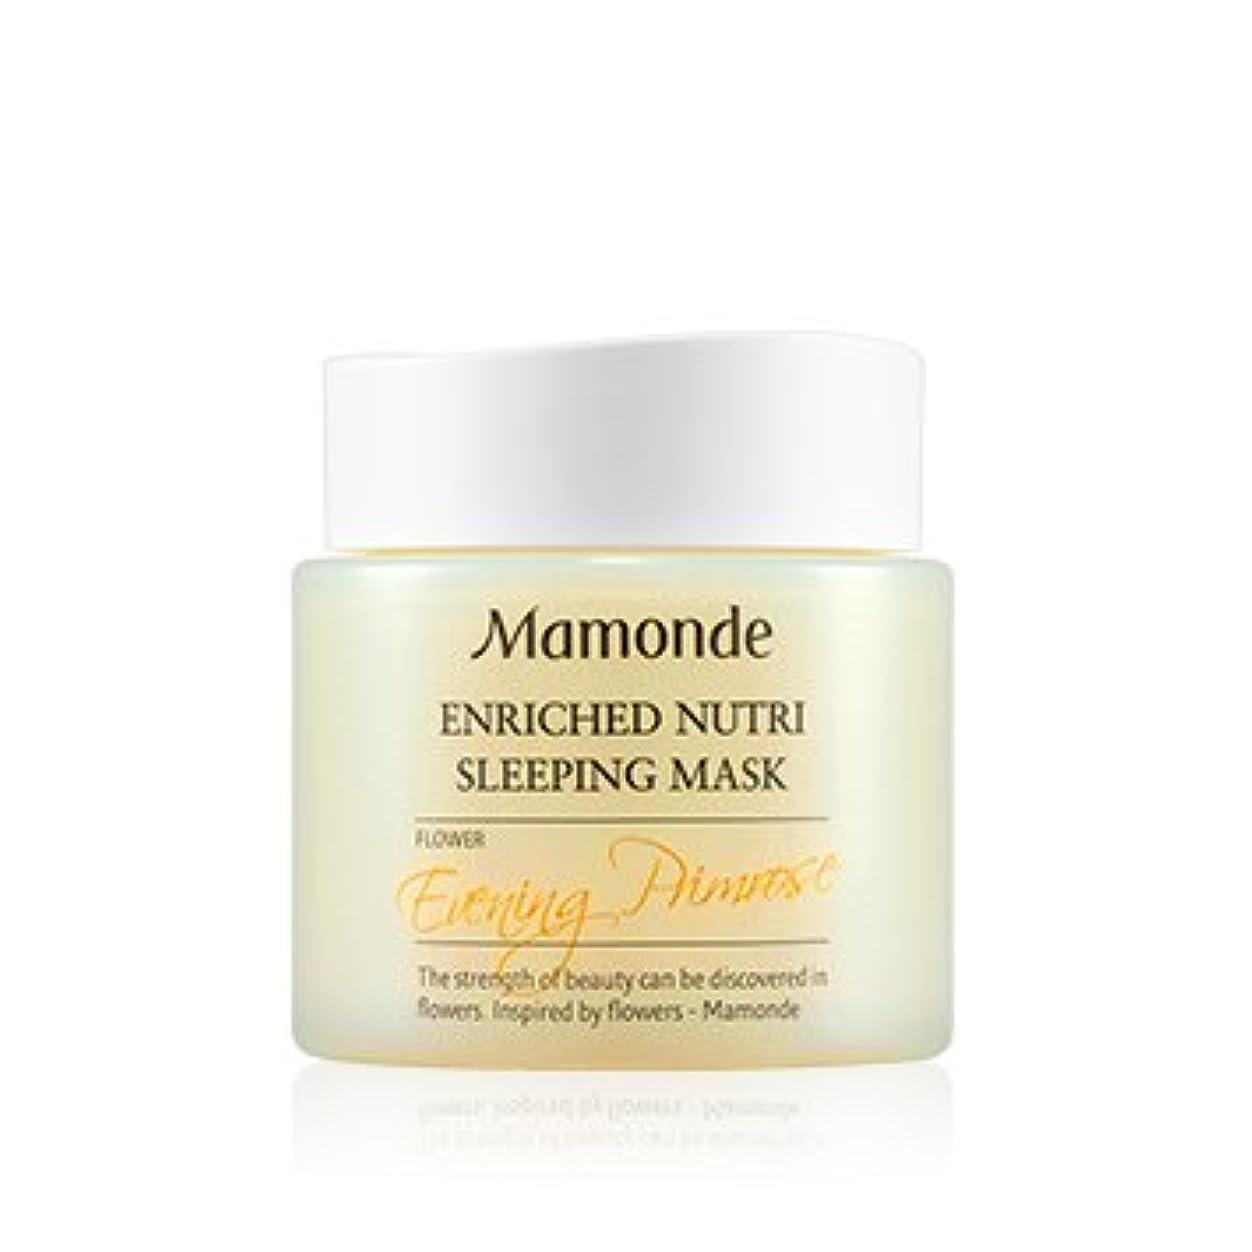 [New] Mamonde Enriched Nutri Sleeping Mask 100ml/マモンド エンリッチド ニュートリ スリーピング マスク 100ml [並行輸入品]